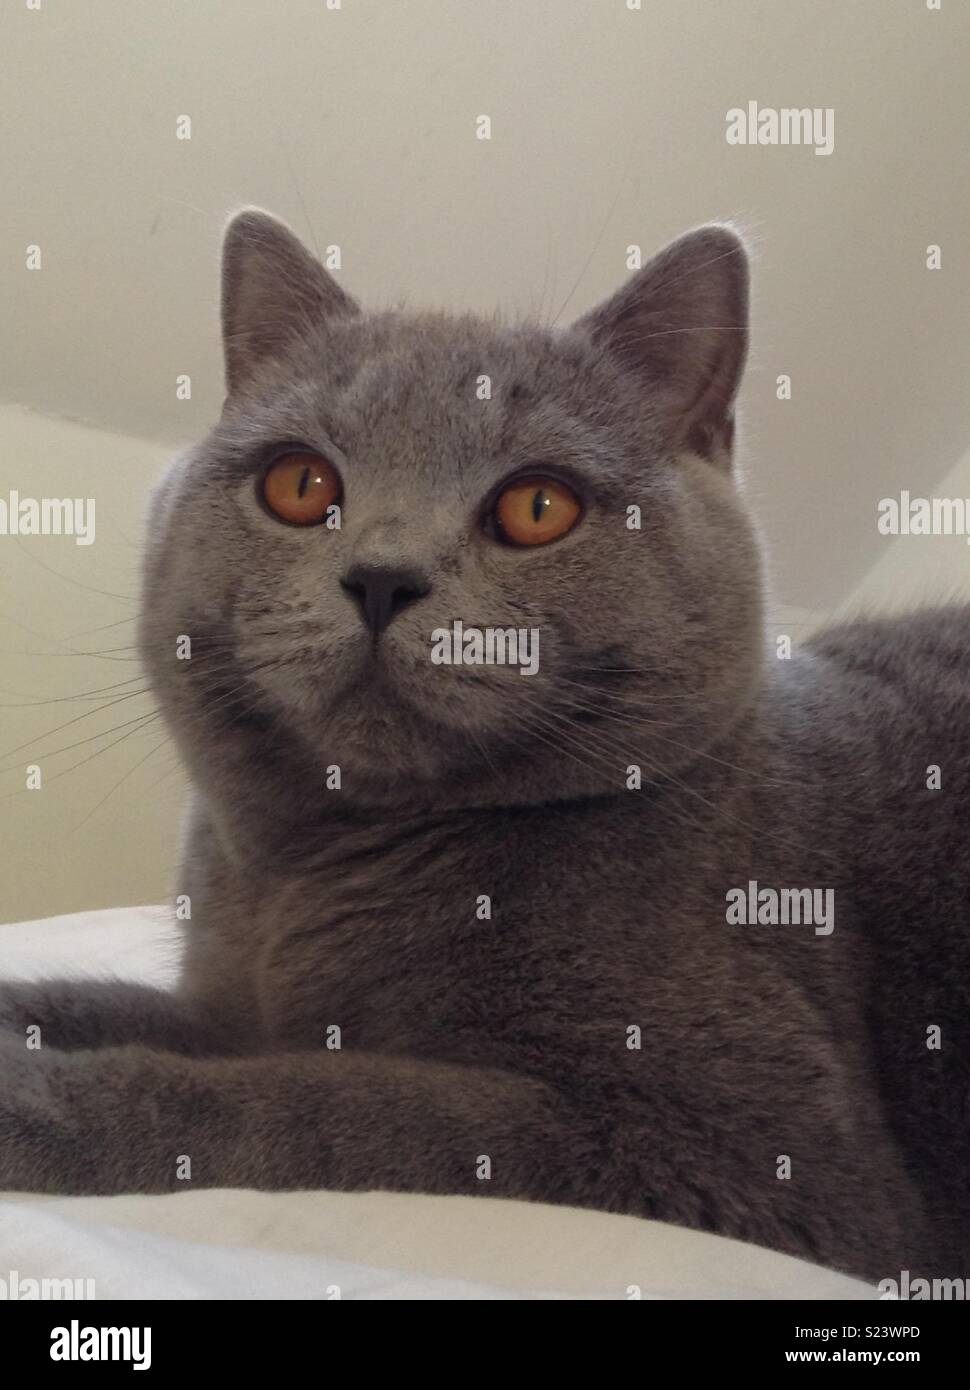 Gorgeous British Shorthaired Cat - Stock Image